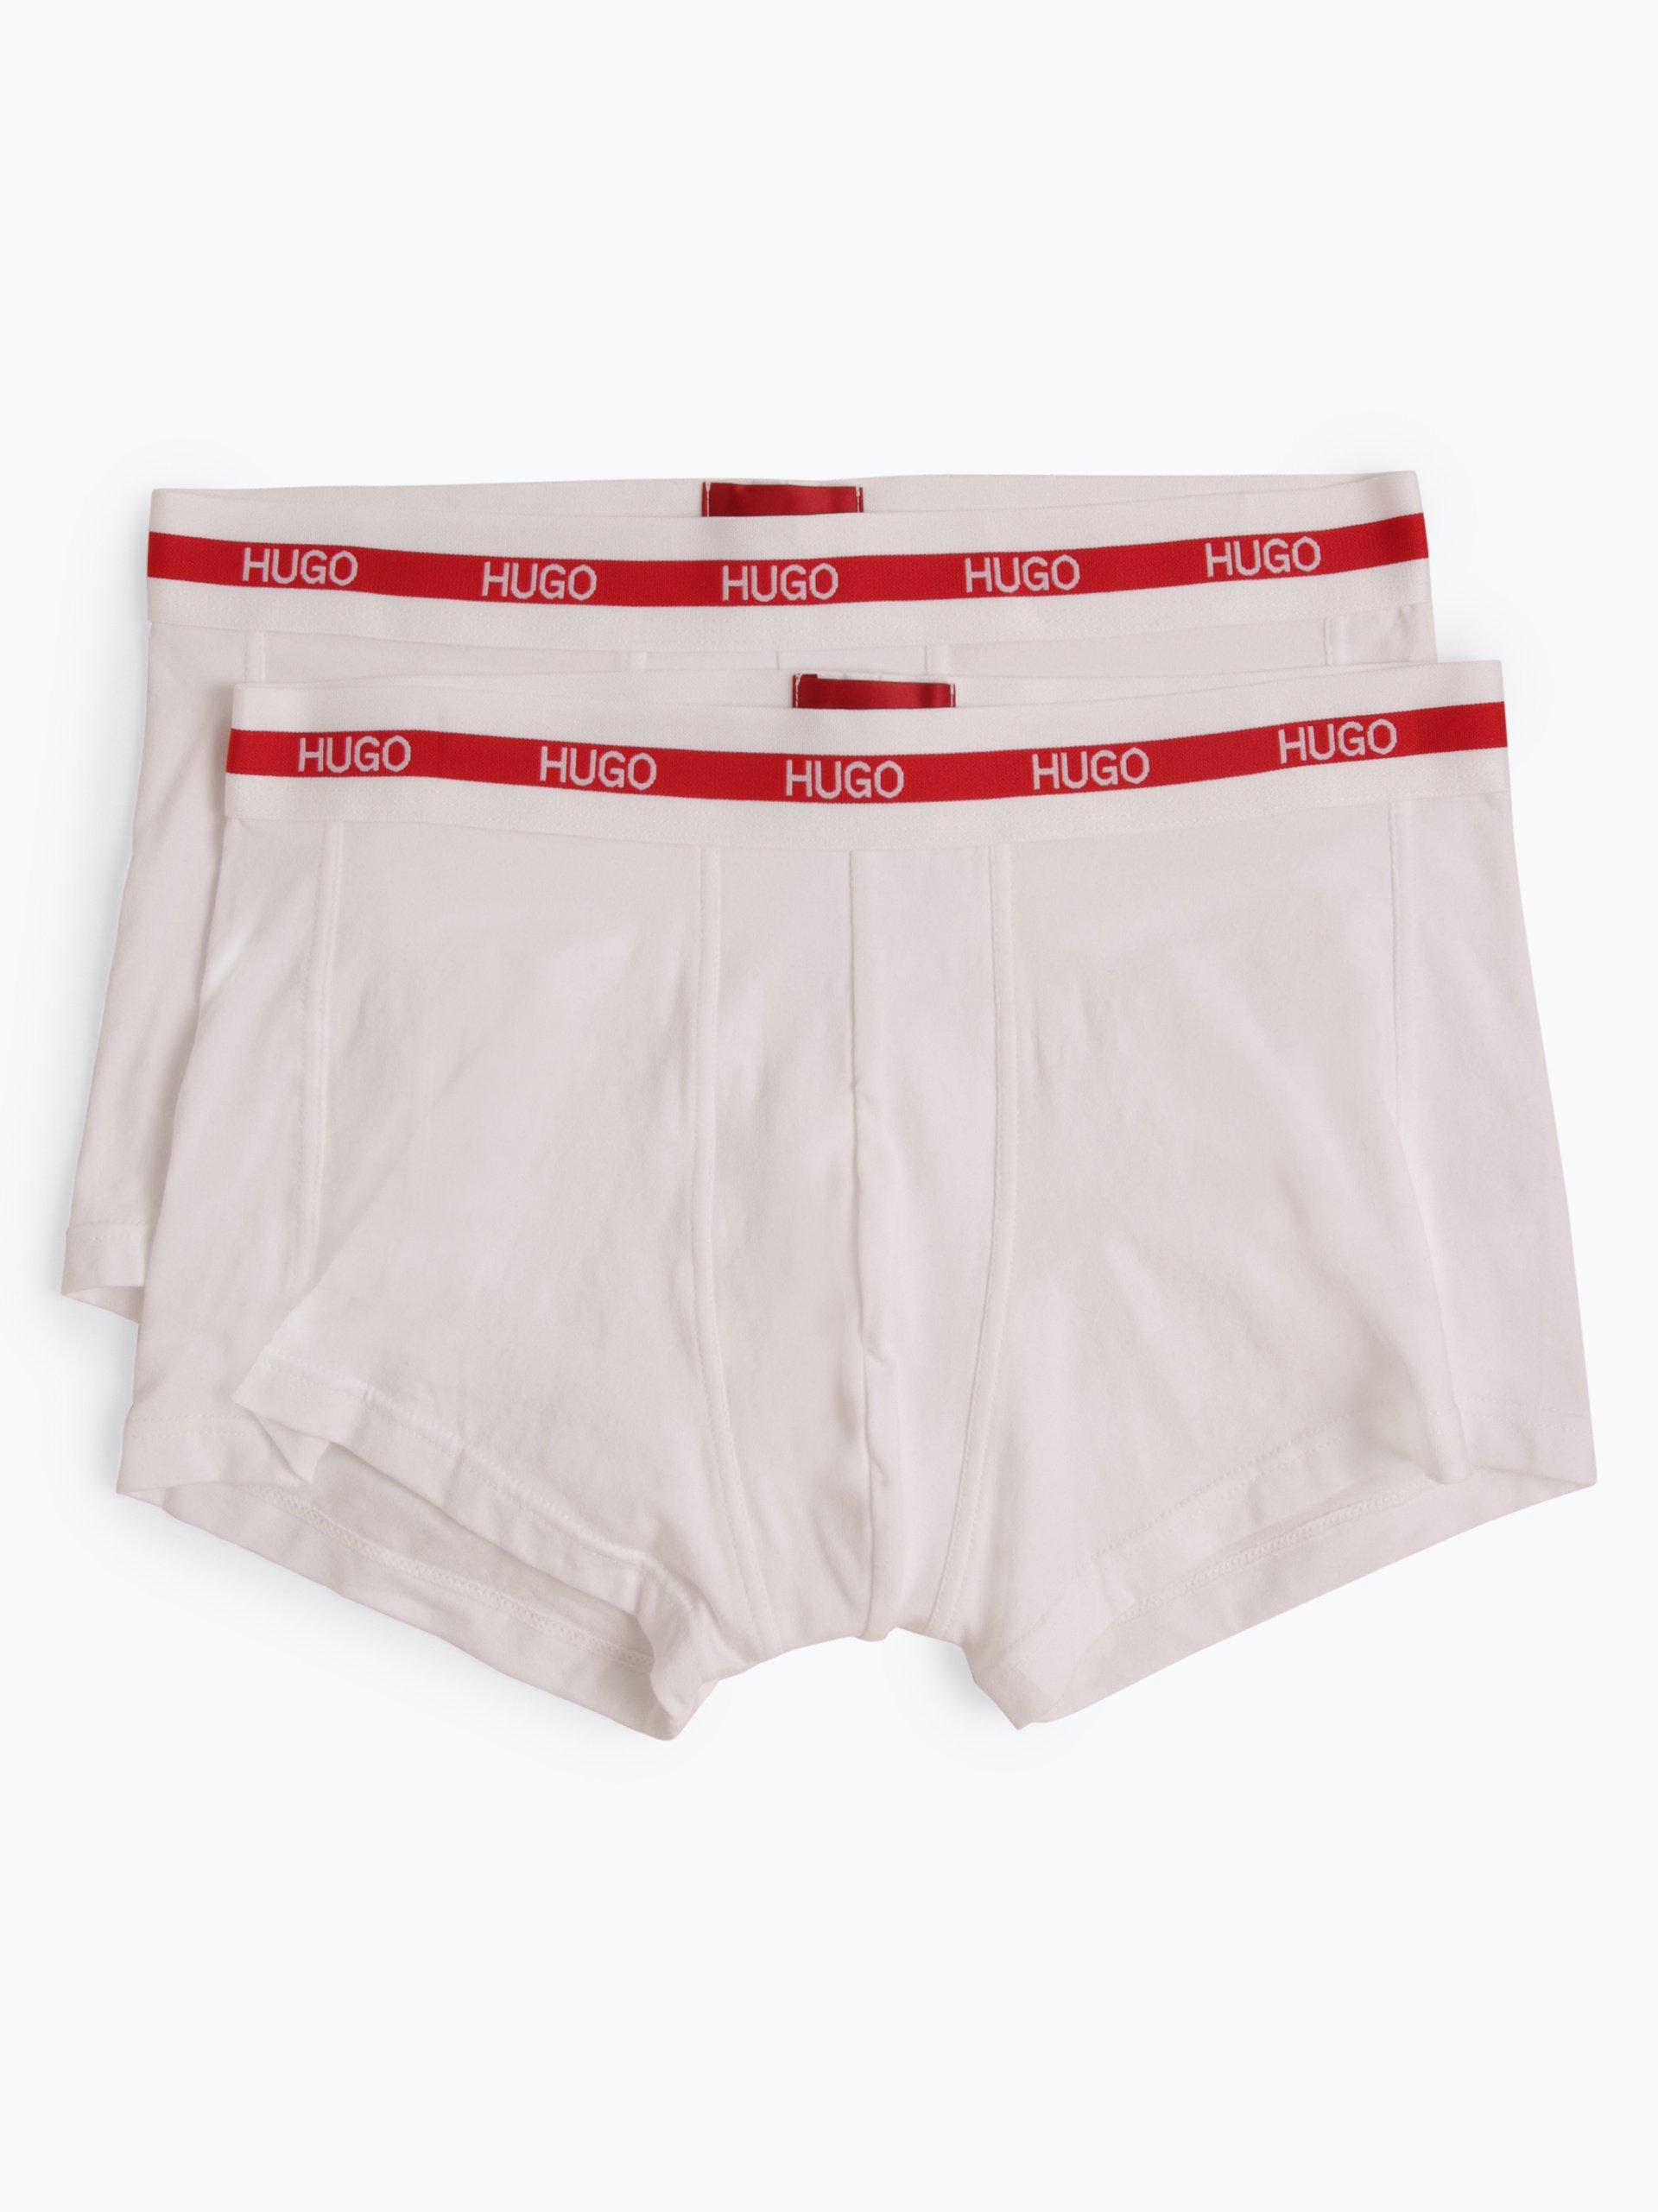 HUGO Obcisłe bokserki męskie pakowane po 2 szt.